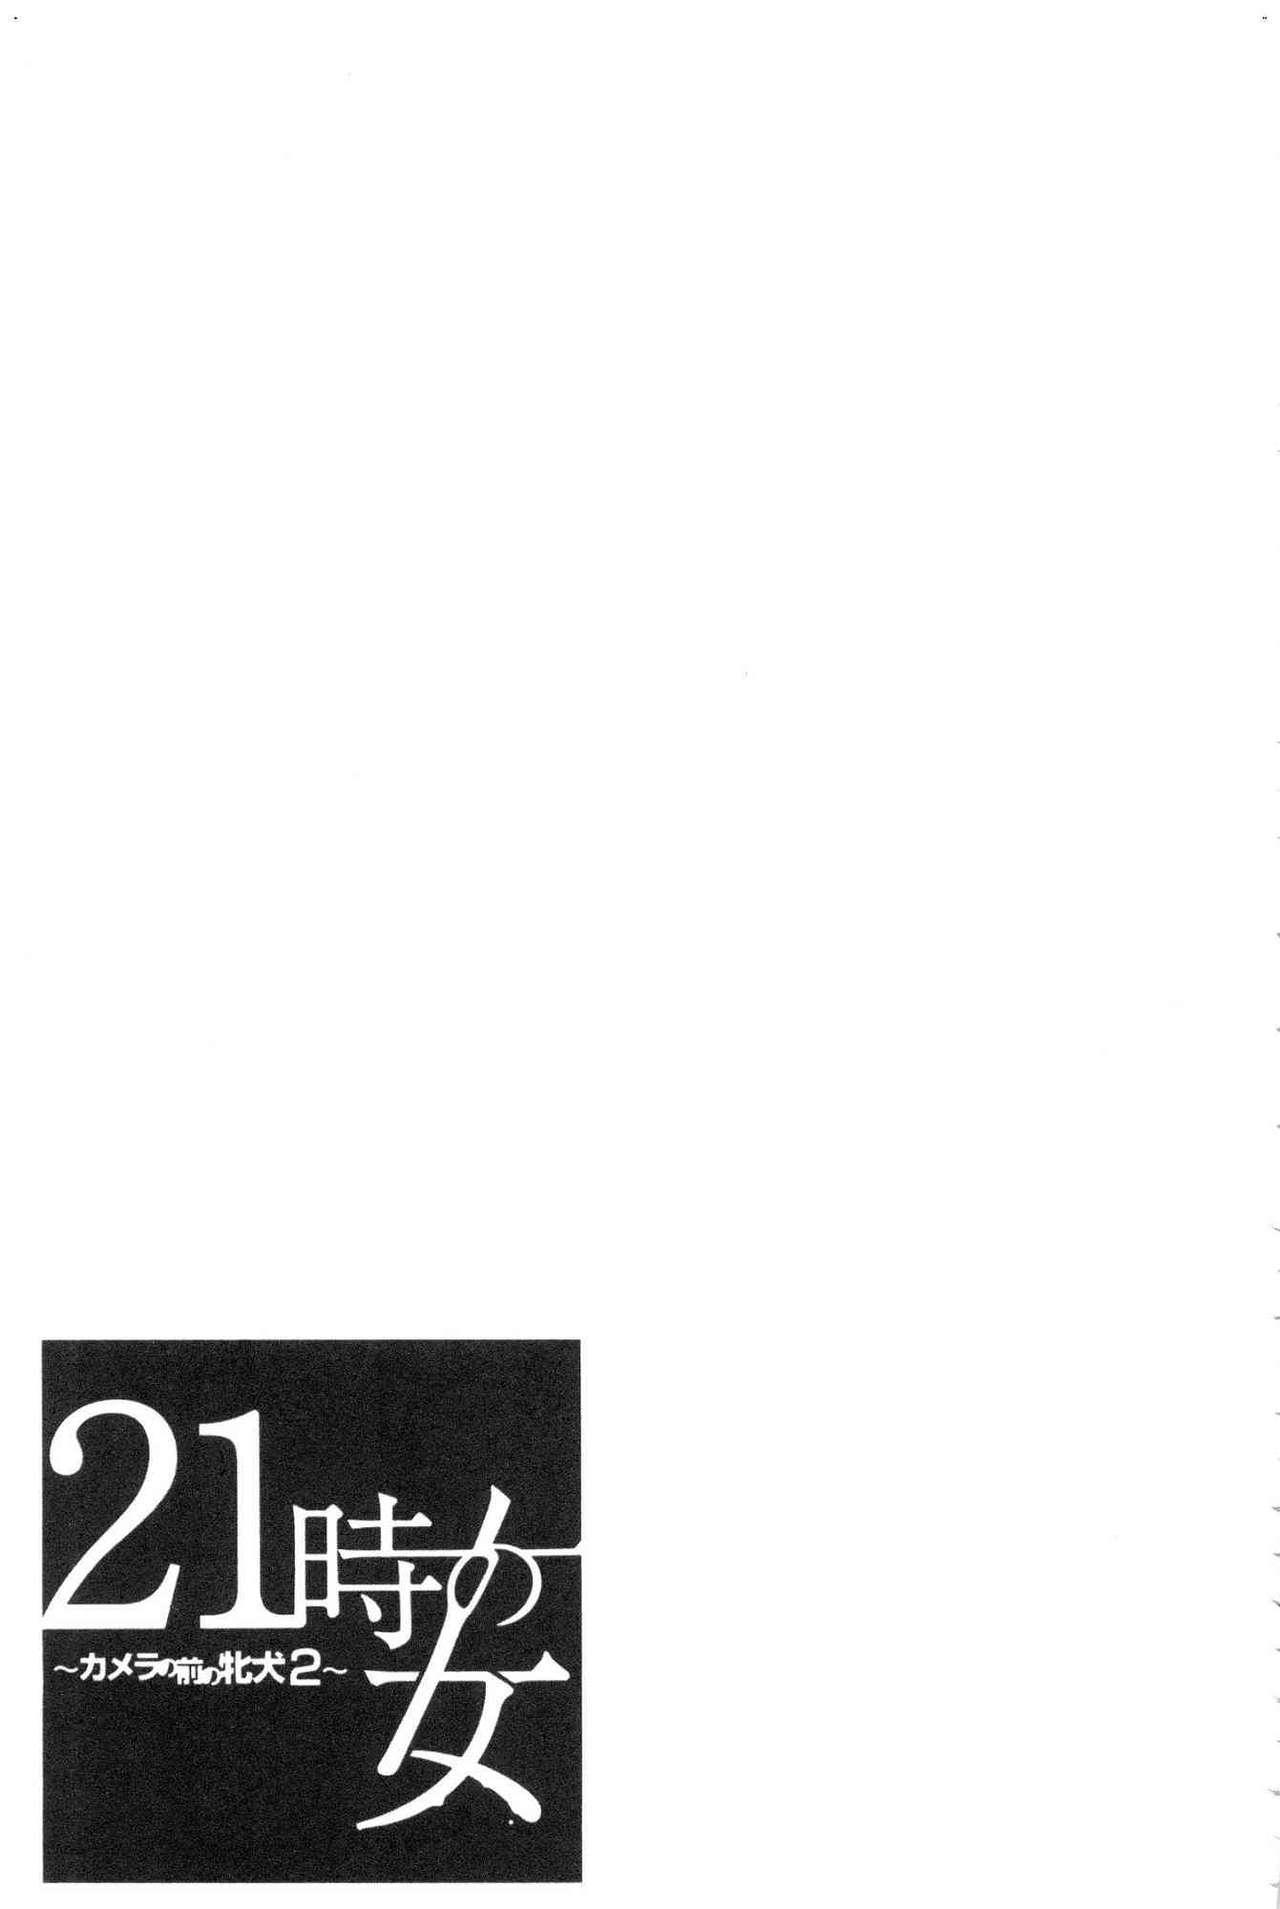 [Gotoh Akira]  21-ji no Onna ~Camera no Mae no Mesuinu~ 2 | 21時之女 ~鏡頭前的牝犬~ 2 [Chinese] 206